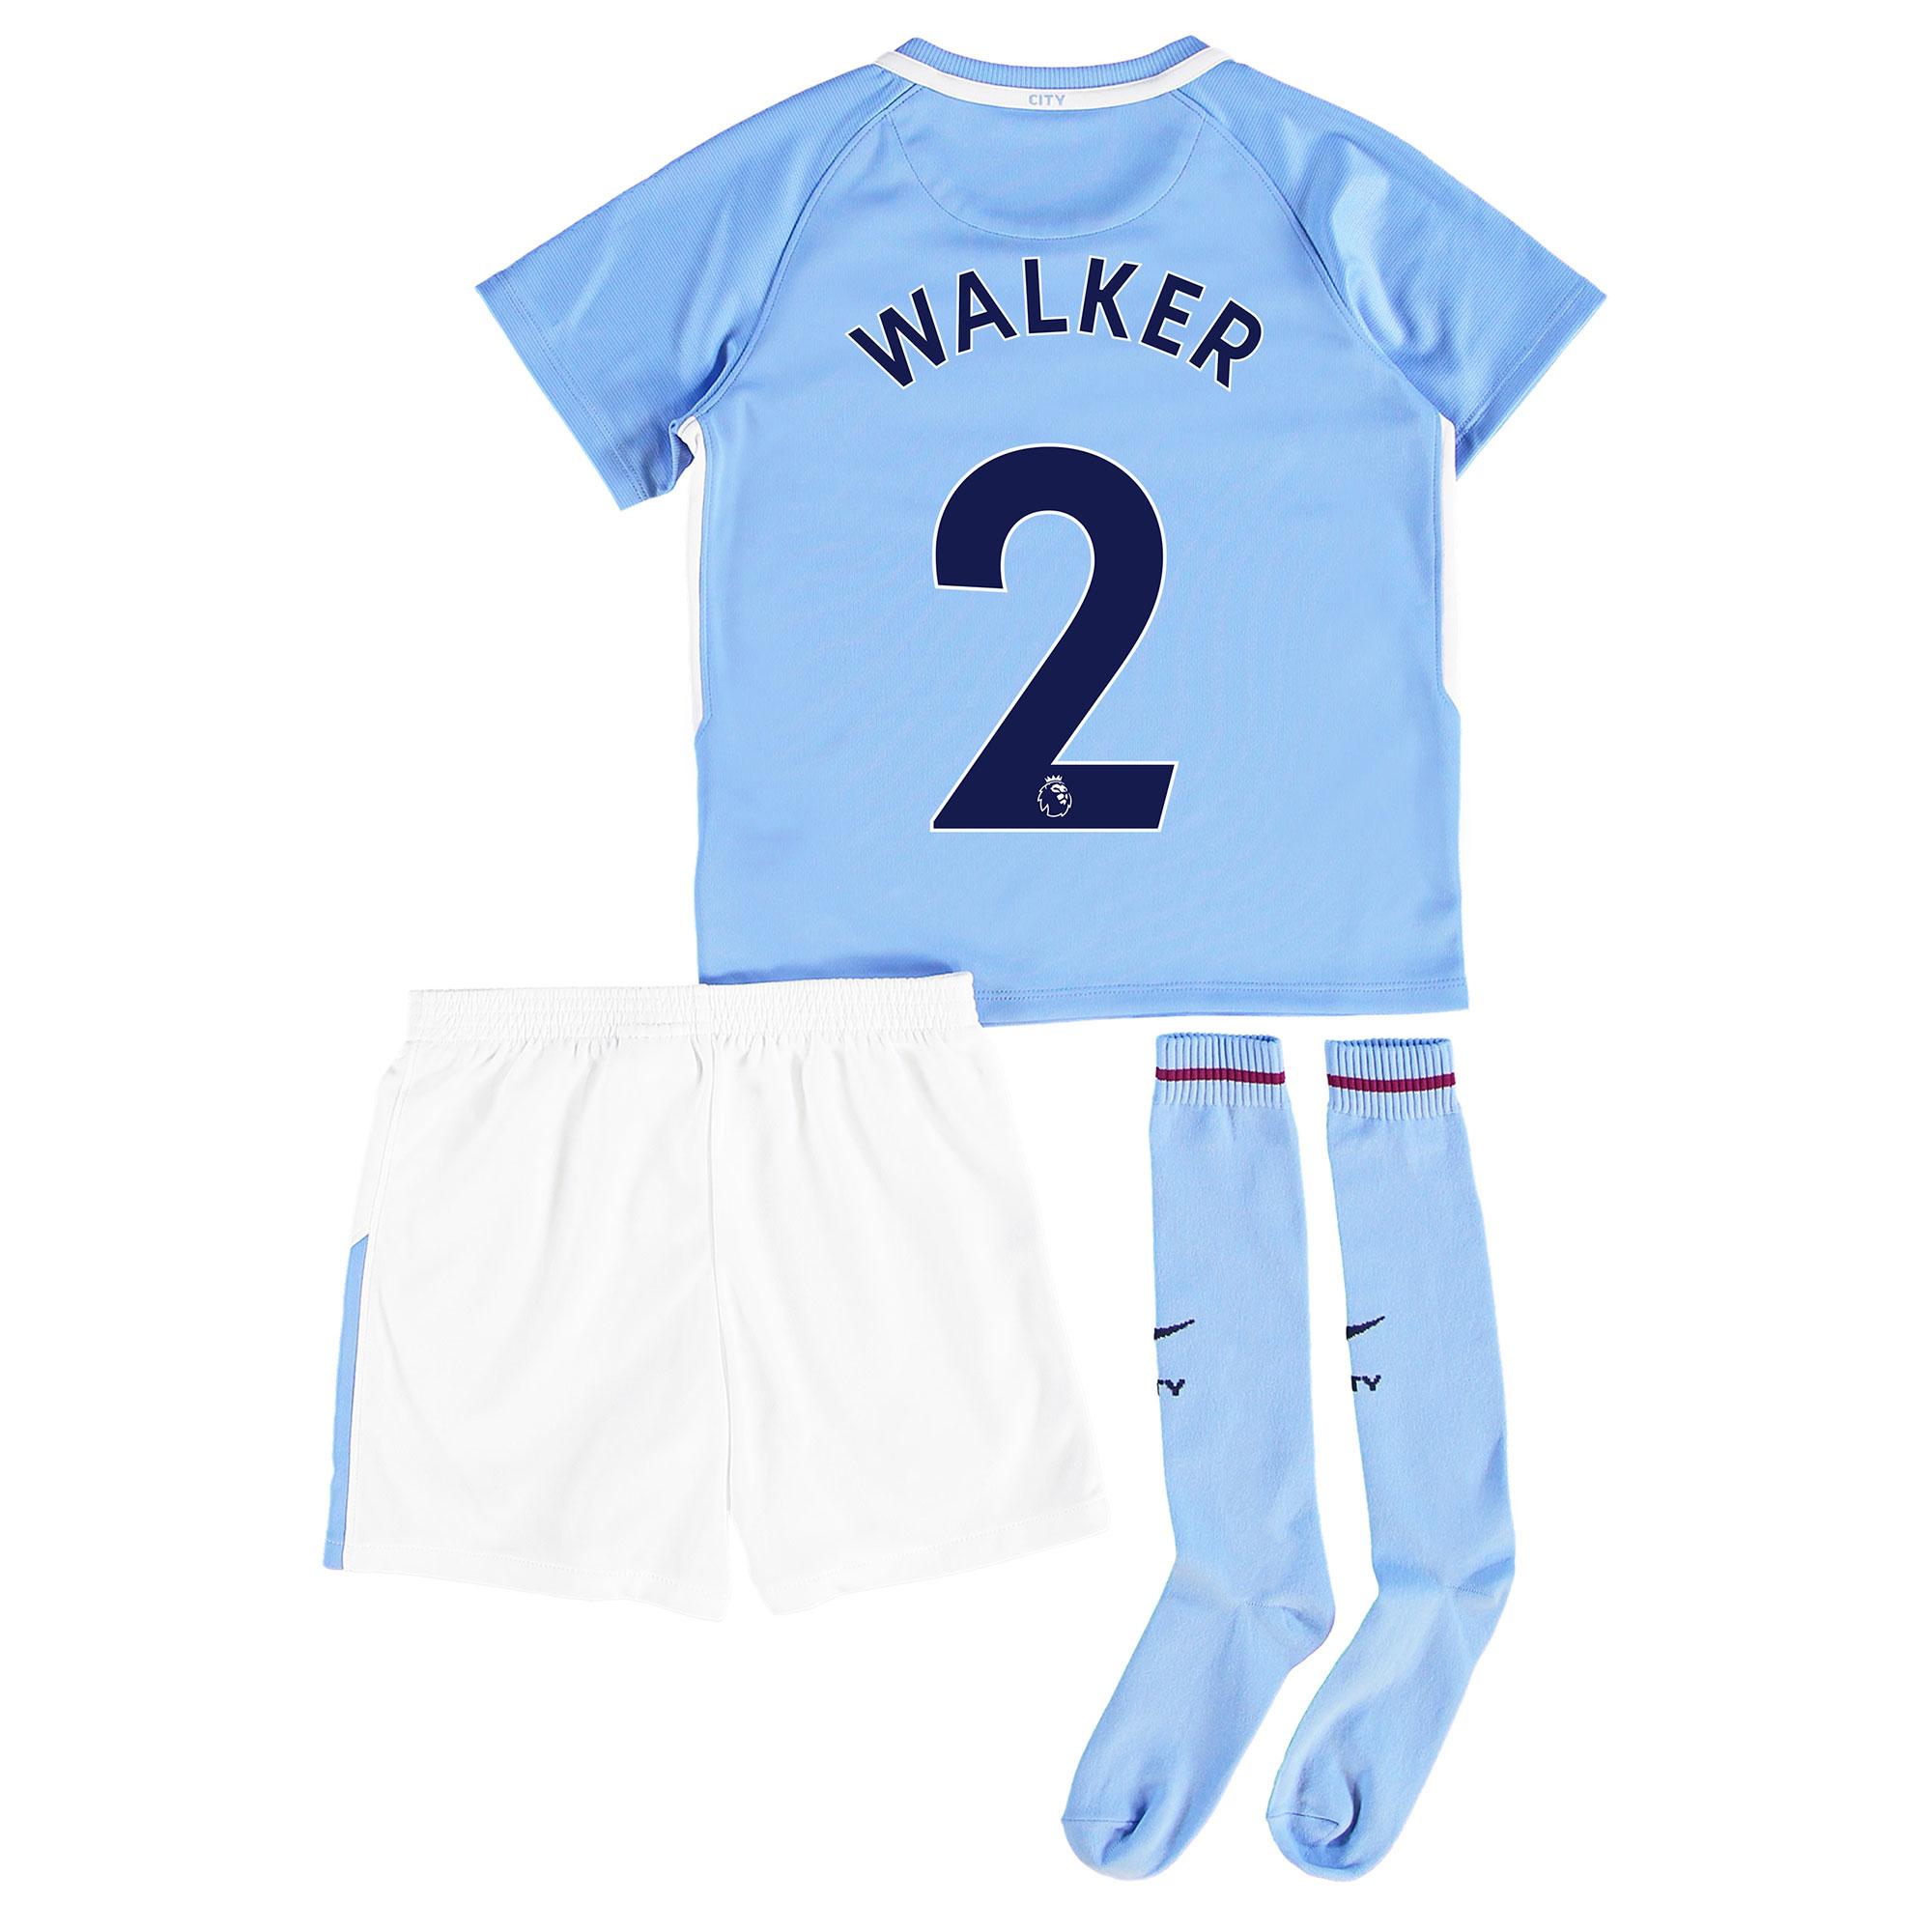 Manchester City Home Stadium Kit 2017-18 - Little Kids with Walker 2 p